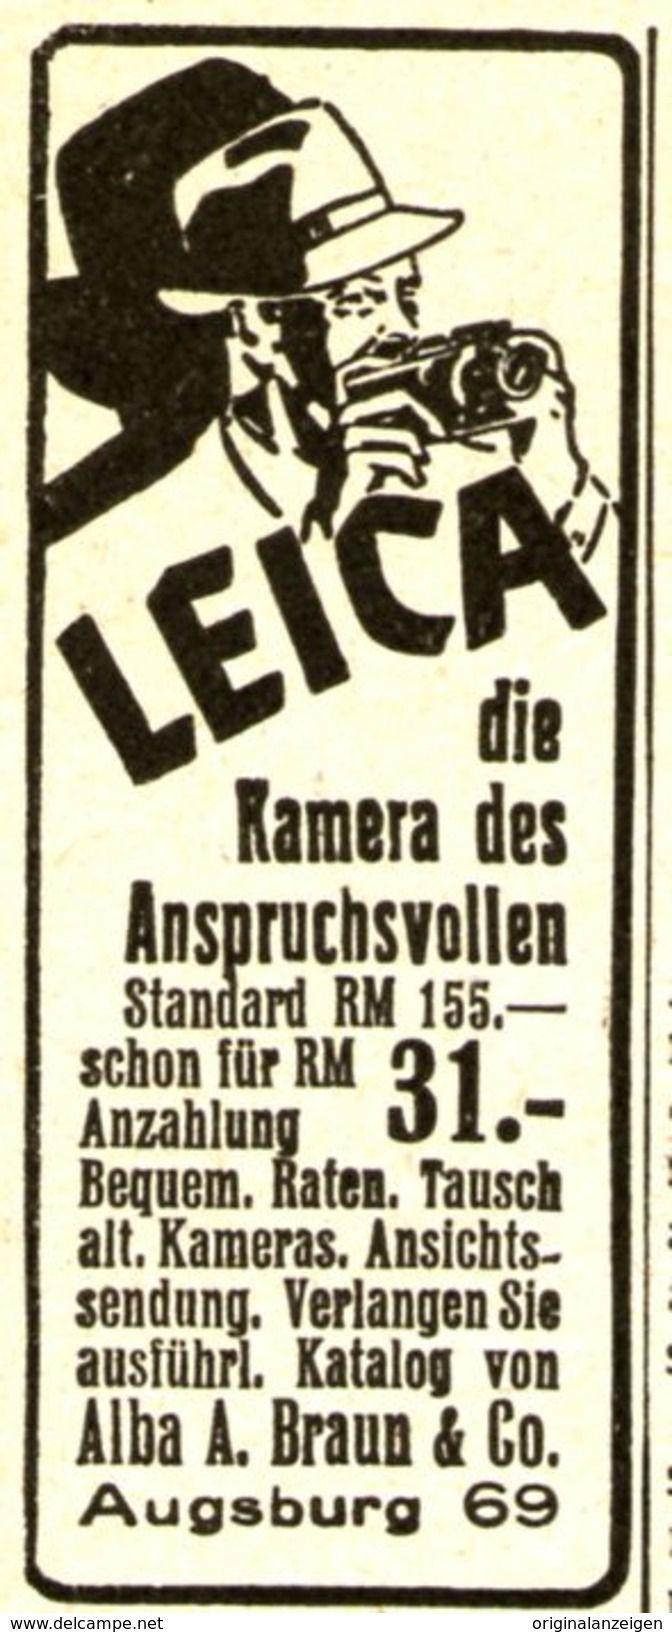 Werbung - Original-Werbung/ Anzeige 1937 - LEICA KAMERA / ALBA A. BRAUN - AUGSBURG - ca. 25 x 55 mm